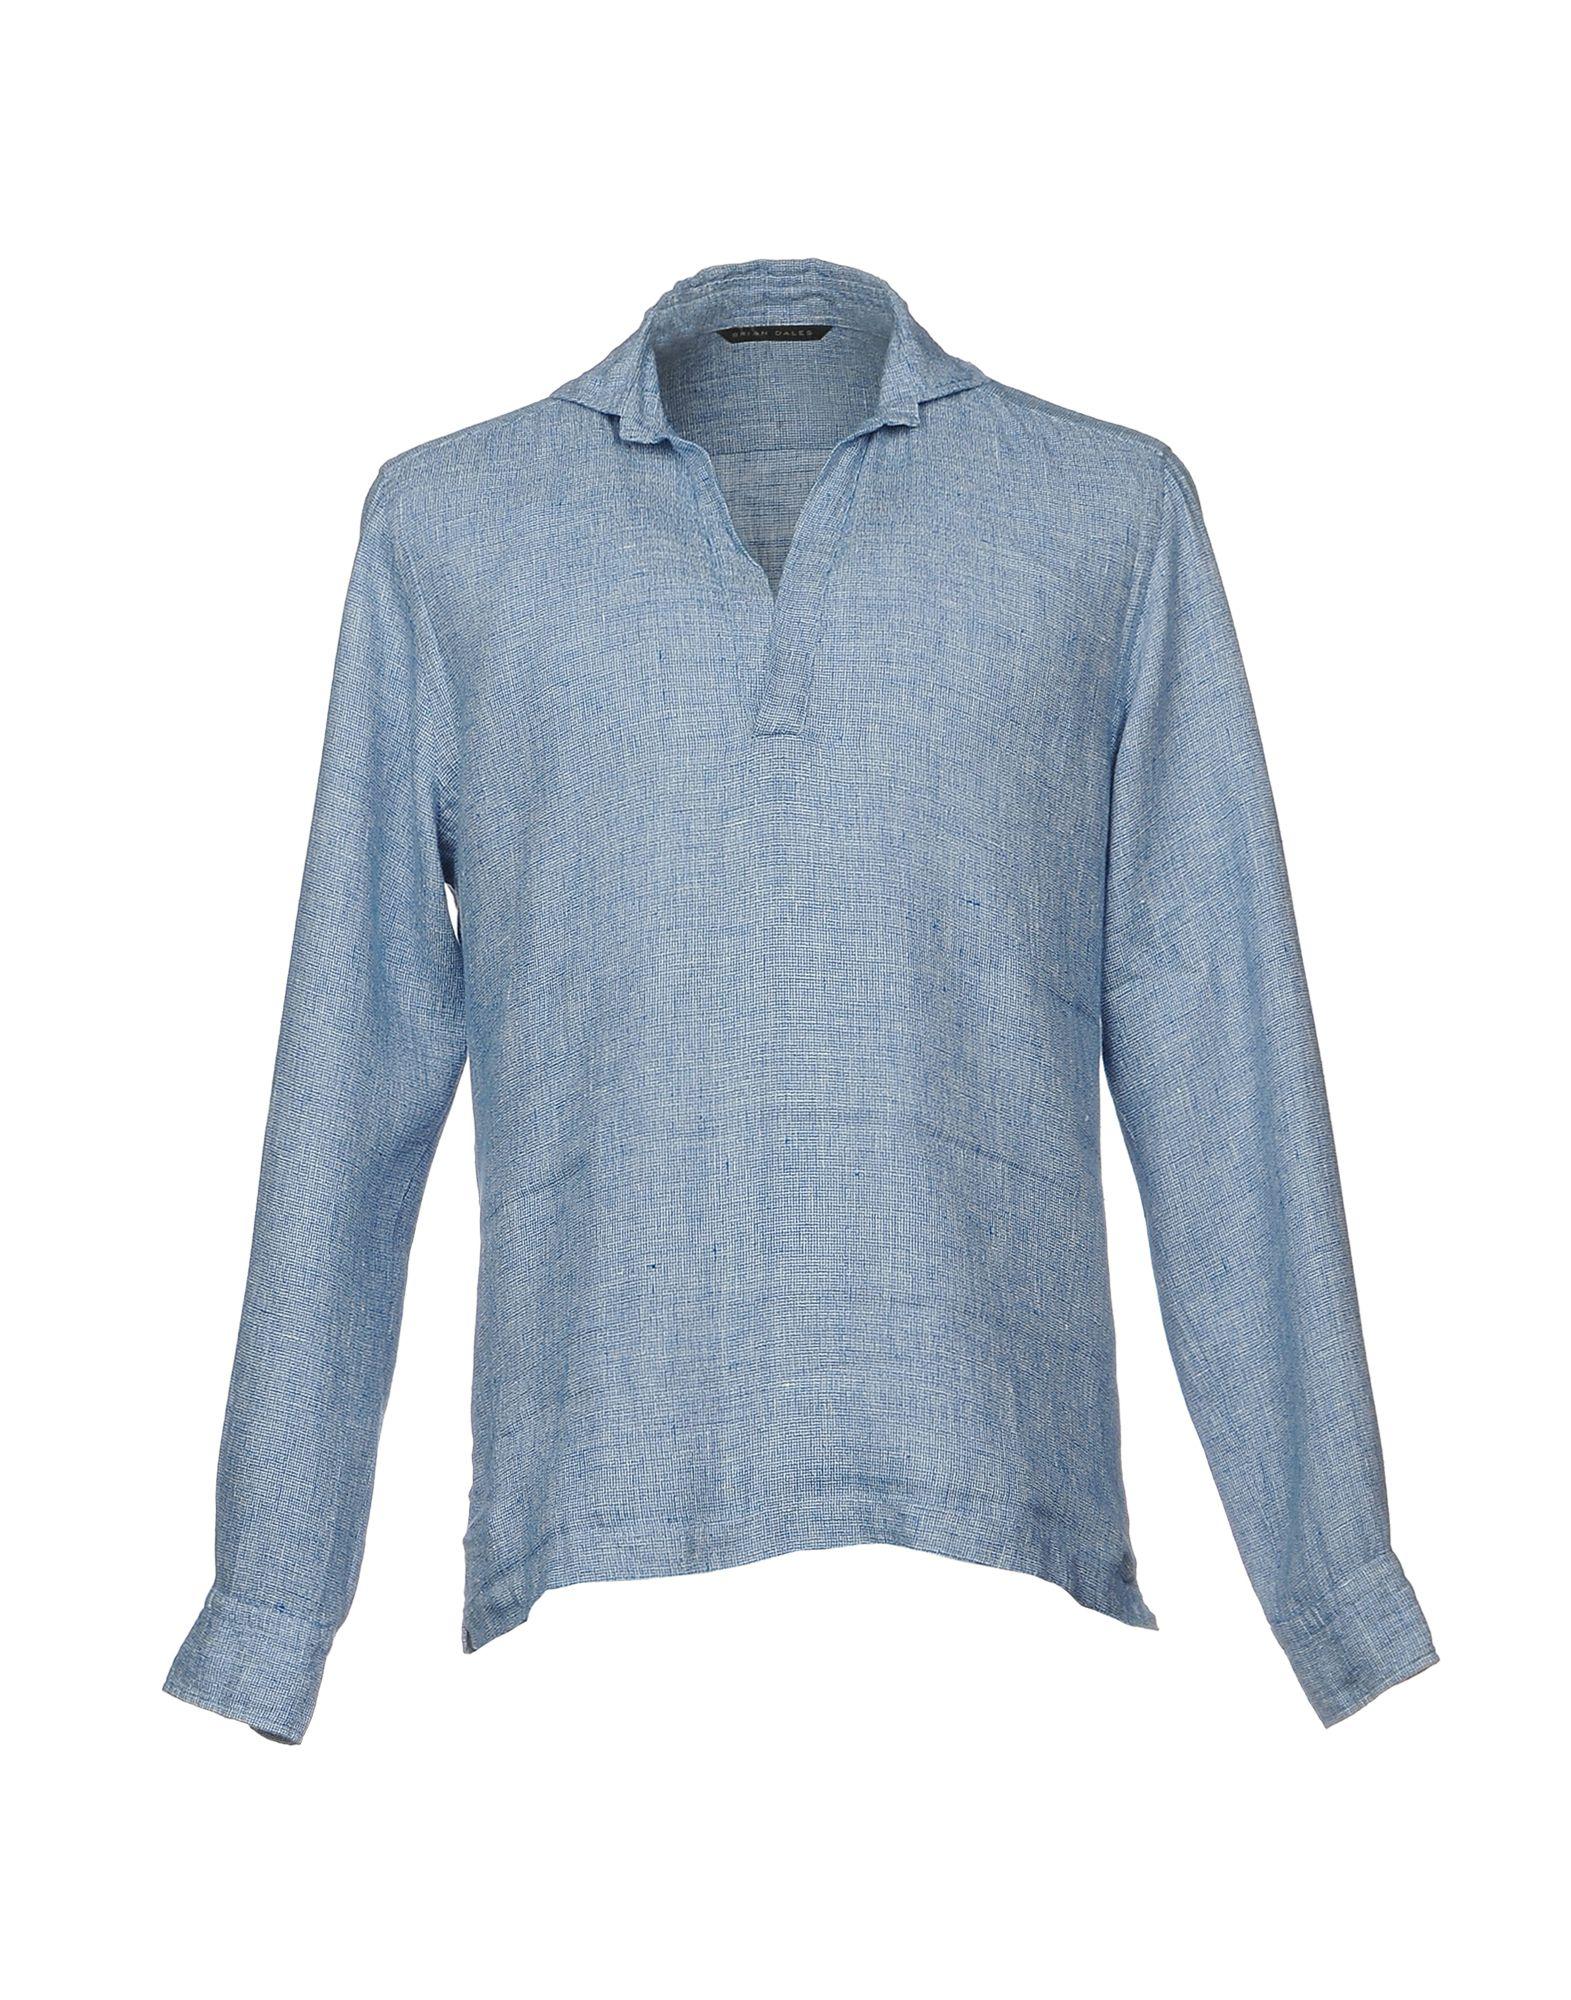 BRIAN DALES Herren Hemd Farbe Himmelblau Größe 4